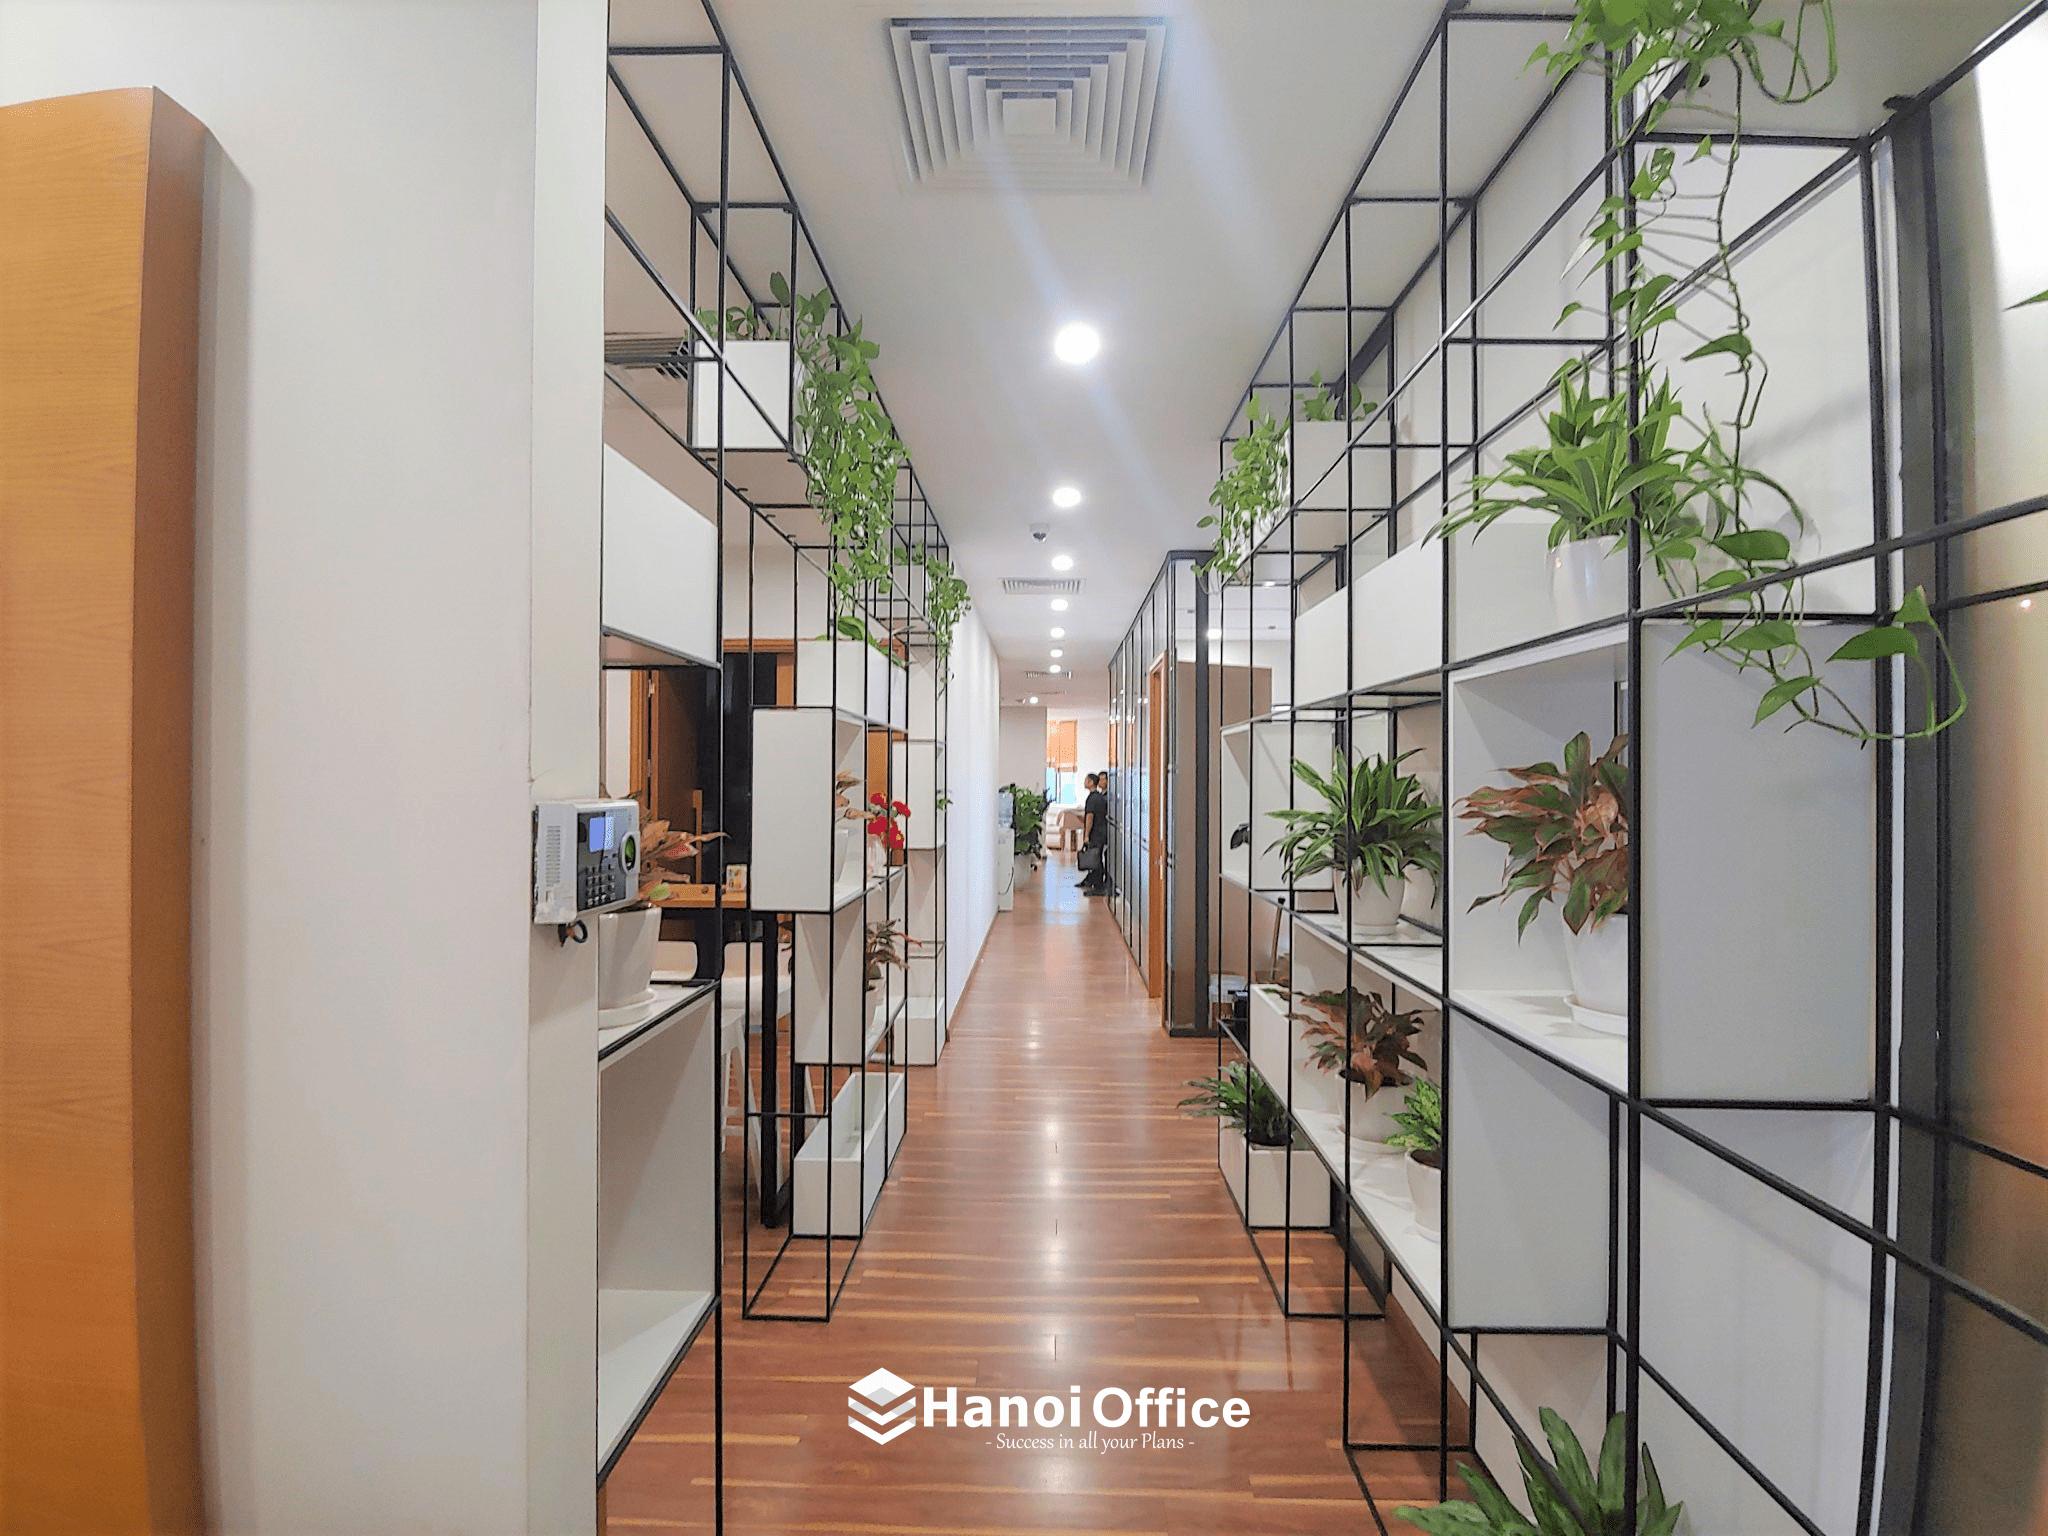 he-thong-van-phong-tron-goi-hanoi-office